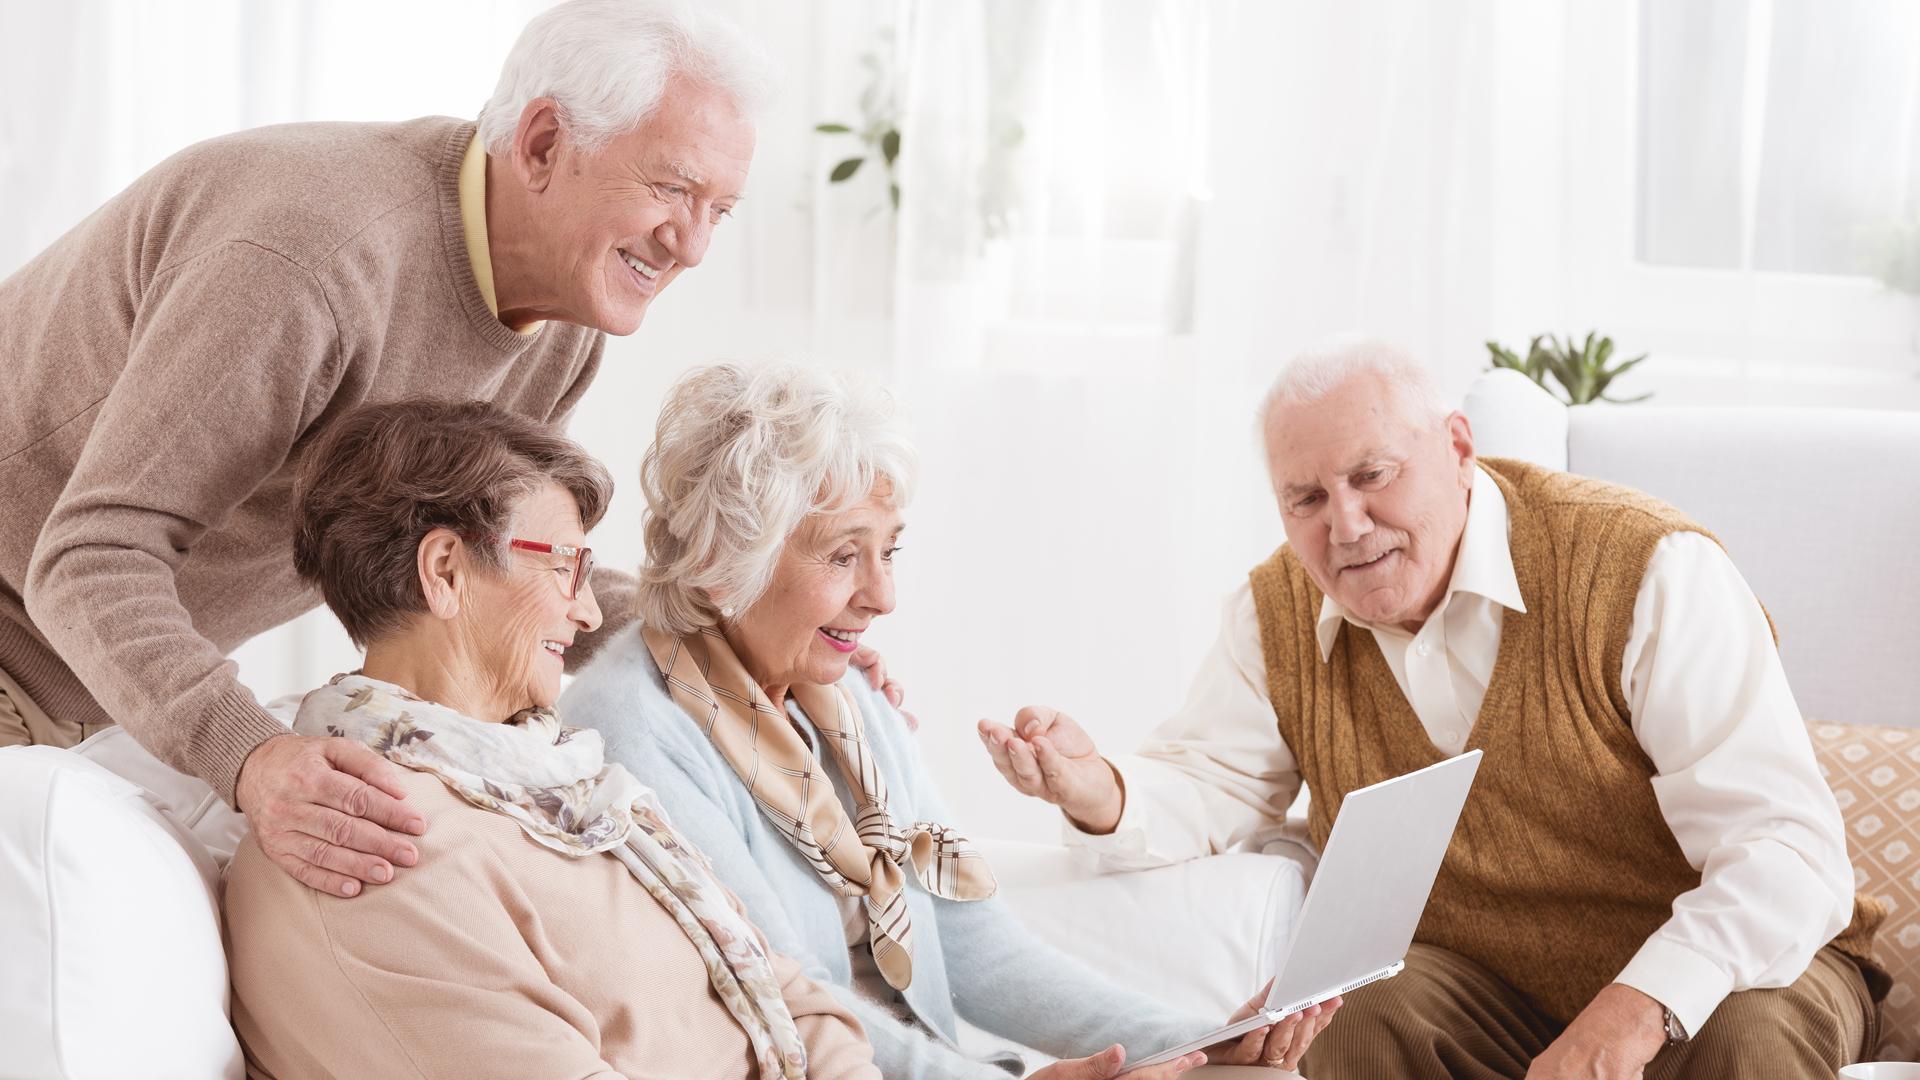 Most Reputable Senior Online Dating Sites In Orlando